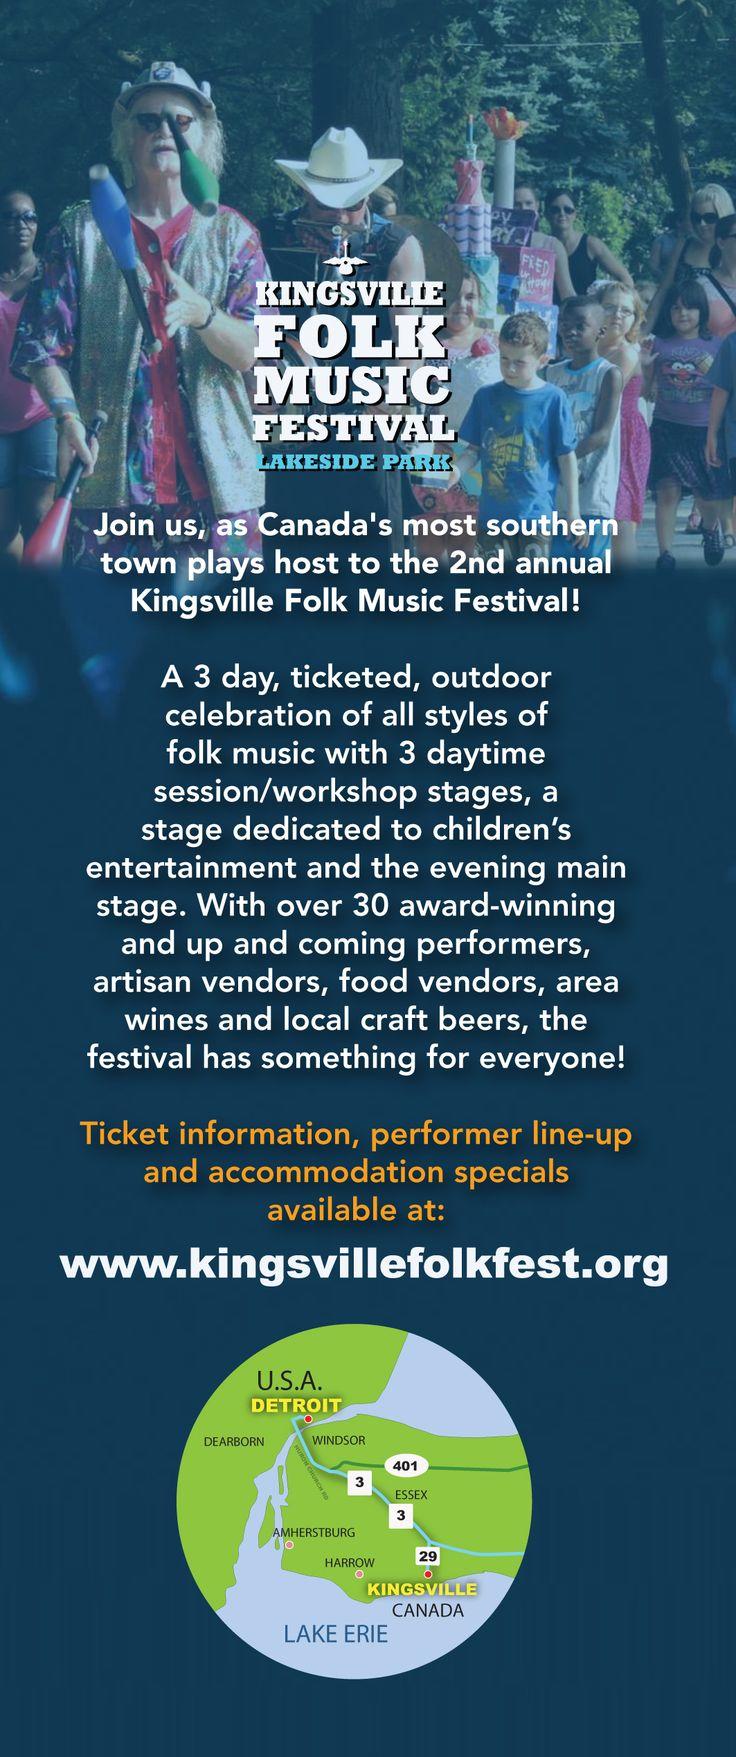 Kingsville Folk Music Festival ~ a project of the Sun Parlour Folk Music Society